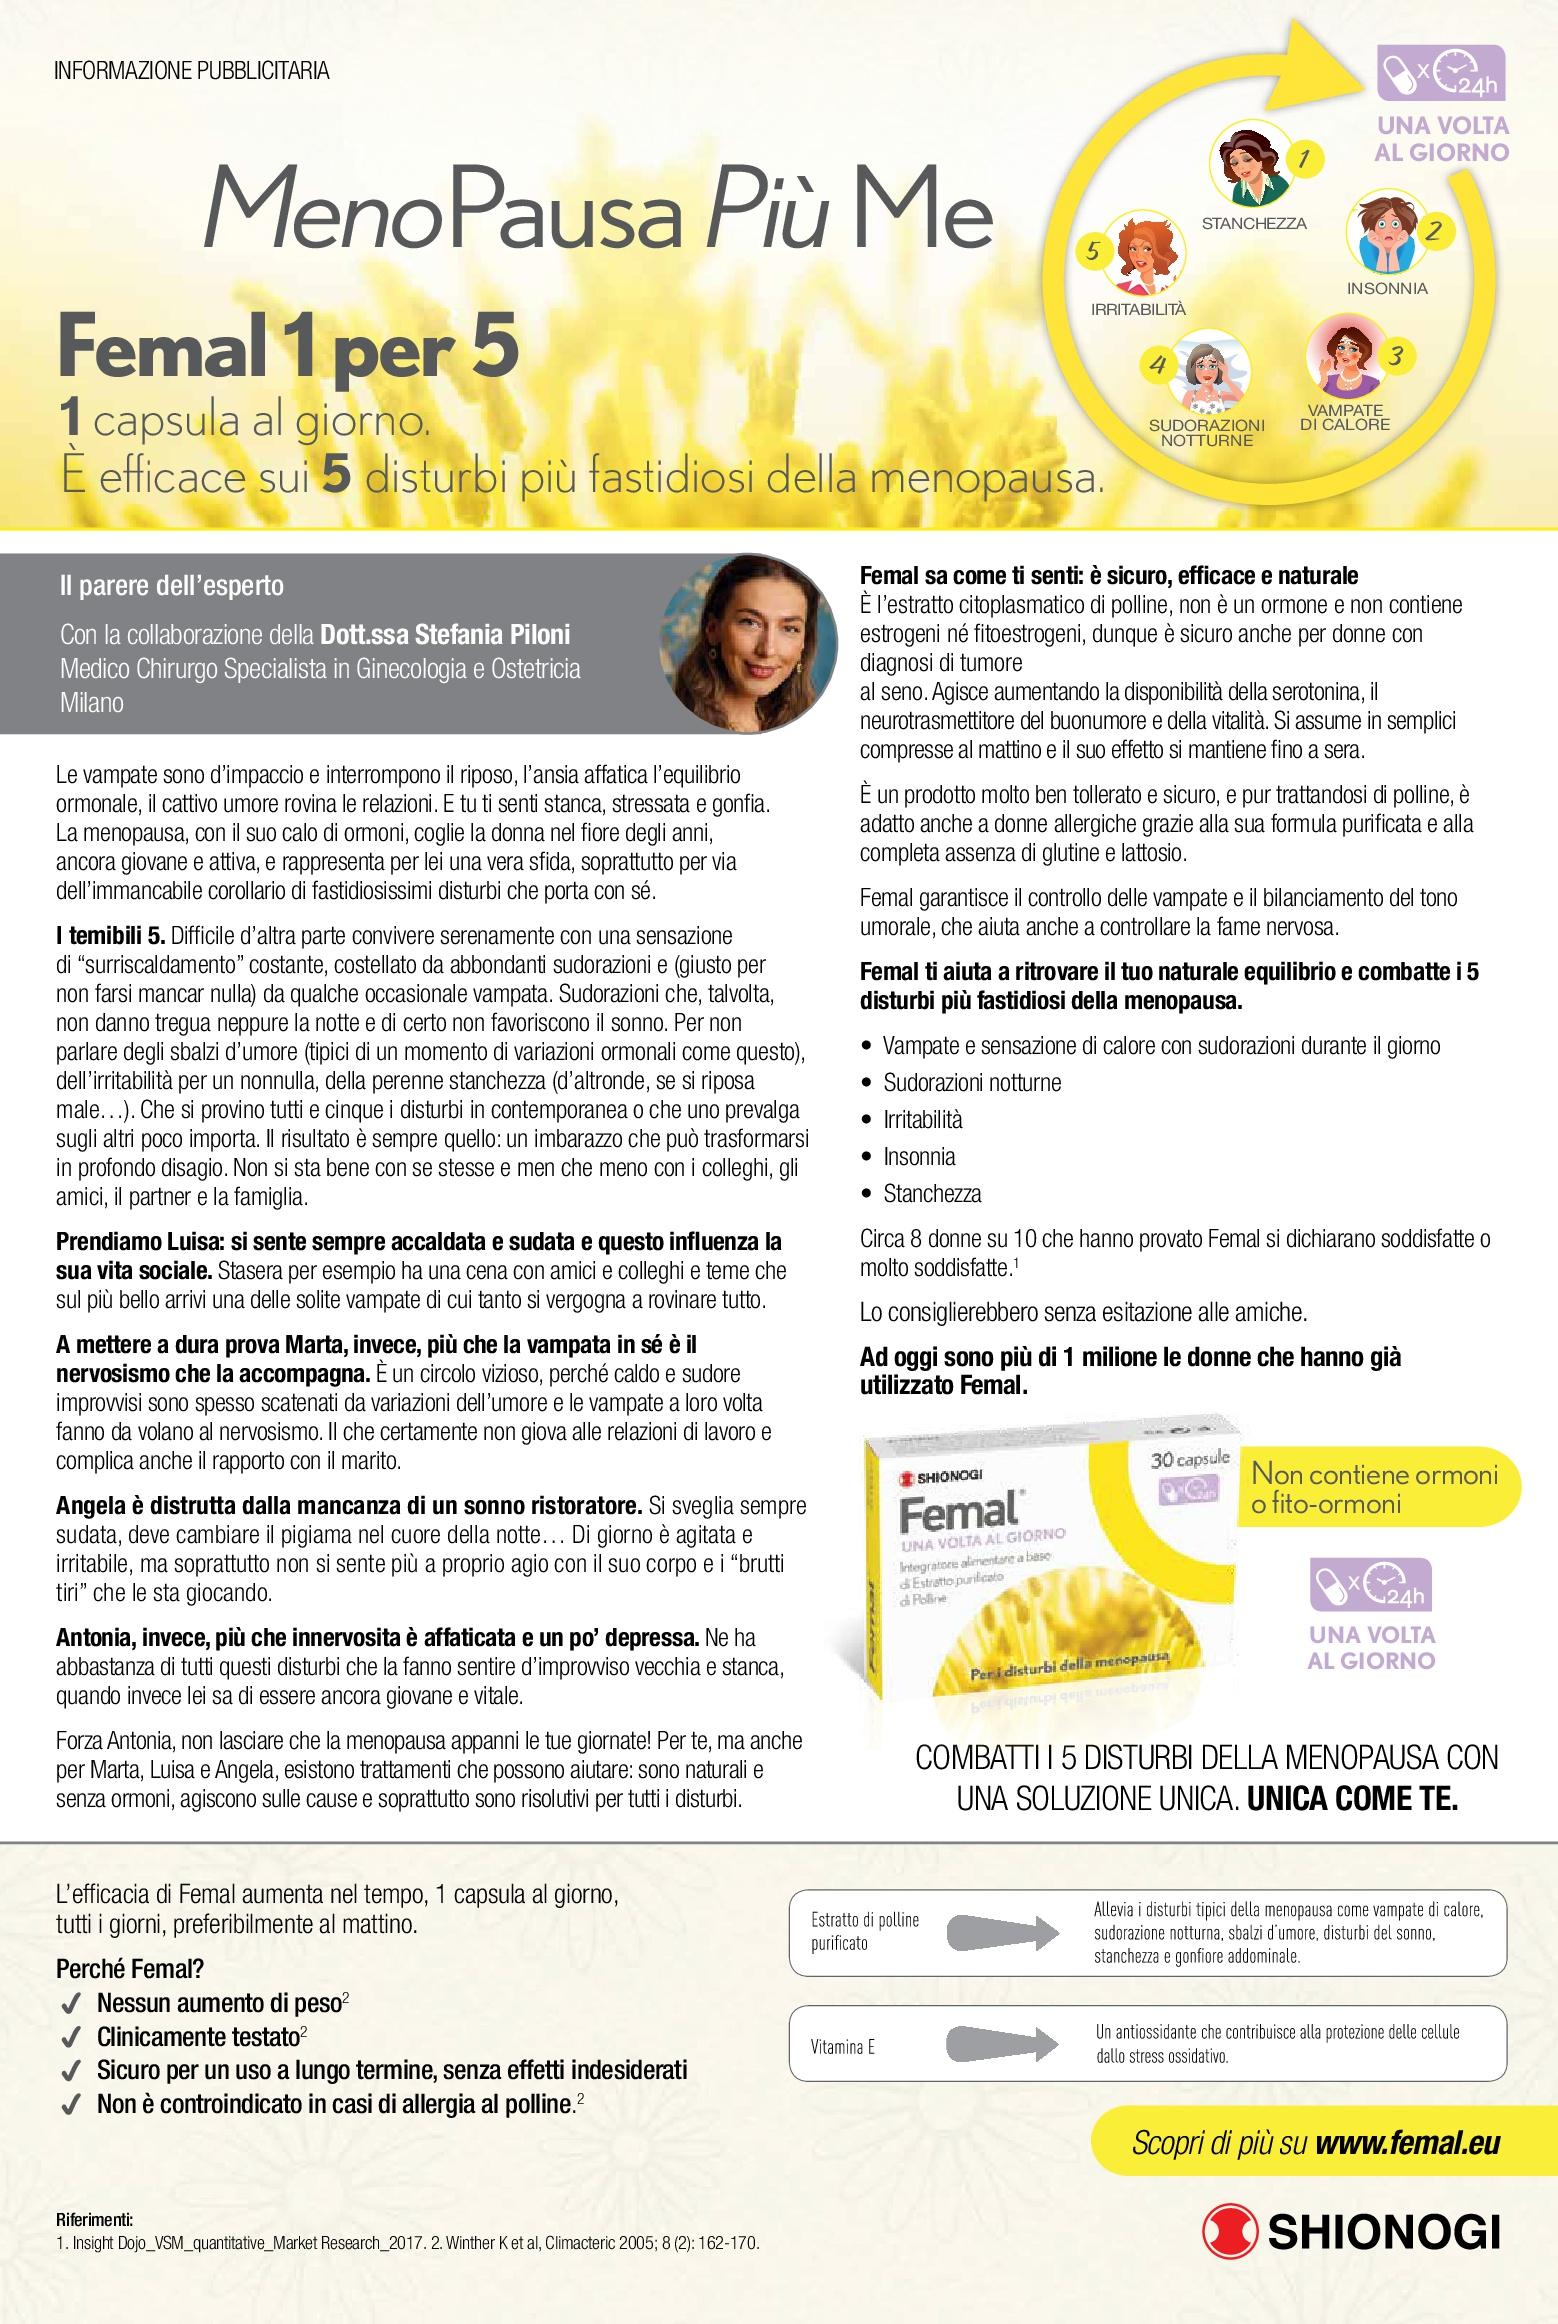 menopausa femal 1 capsula per 5 disturbi adv